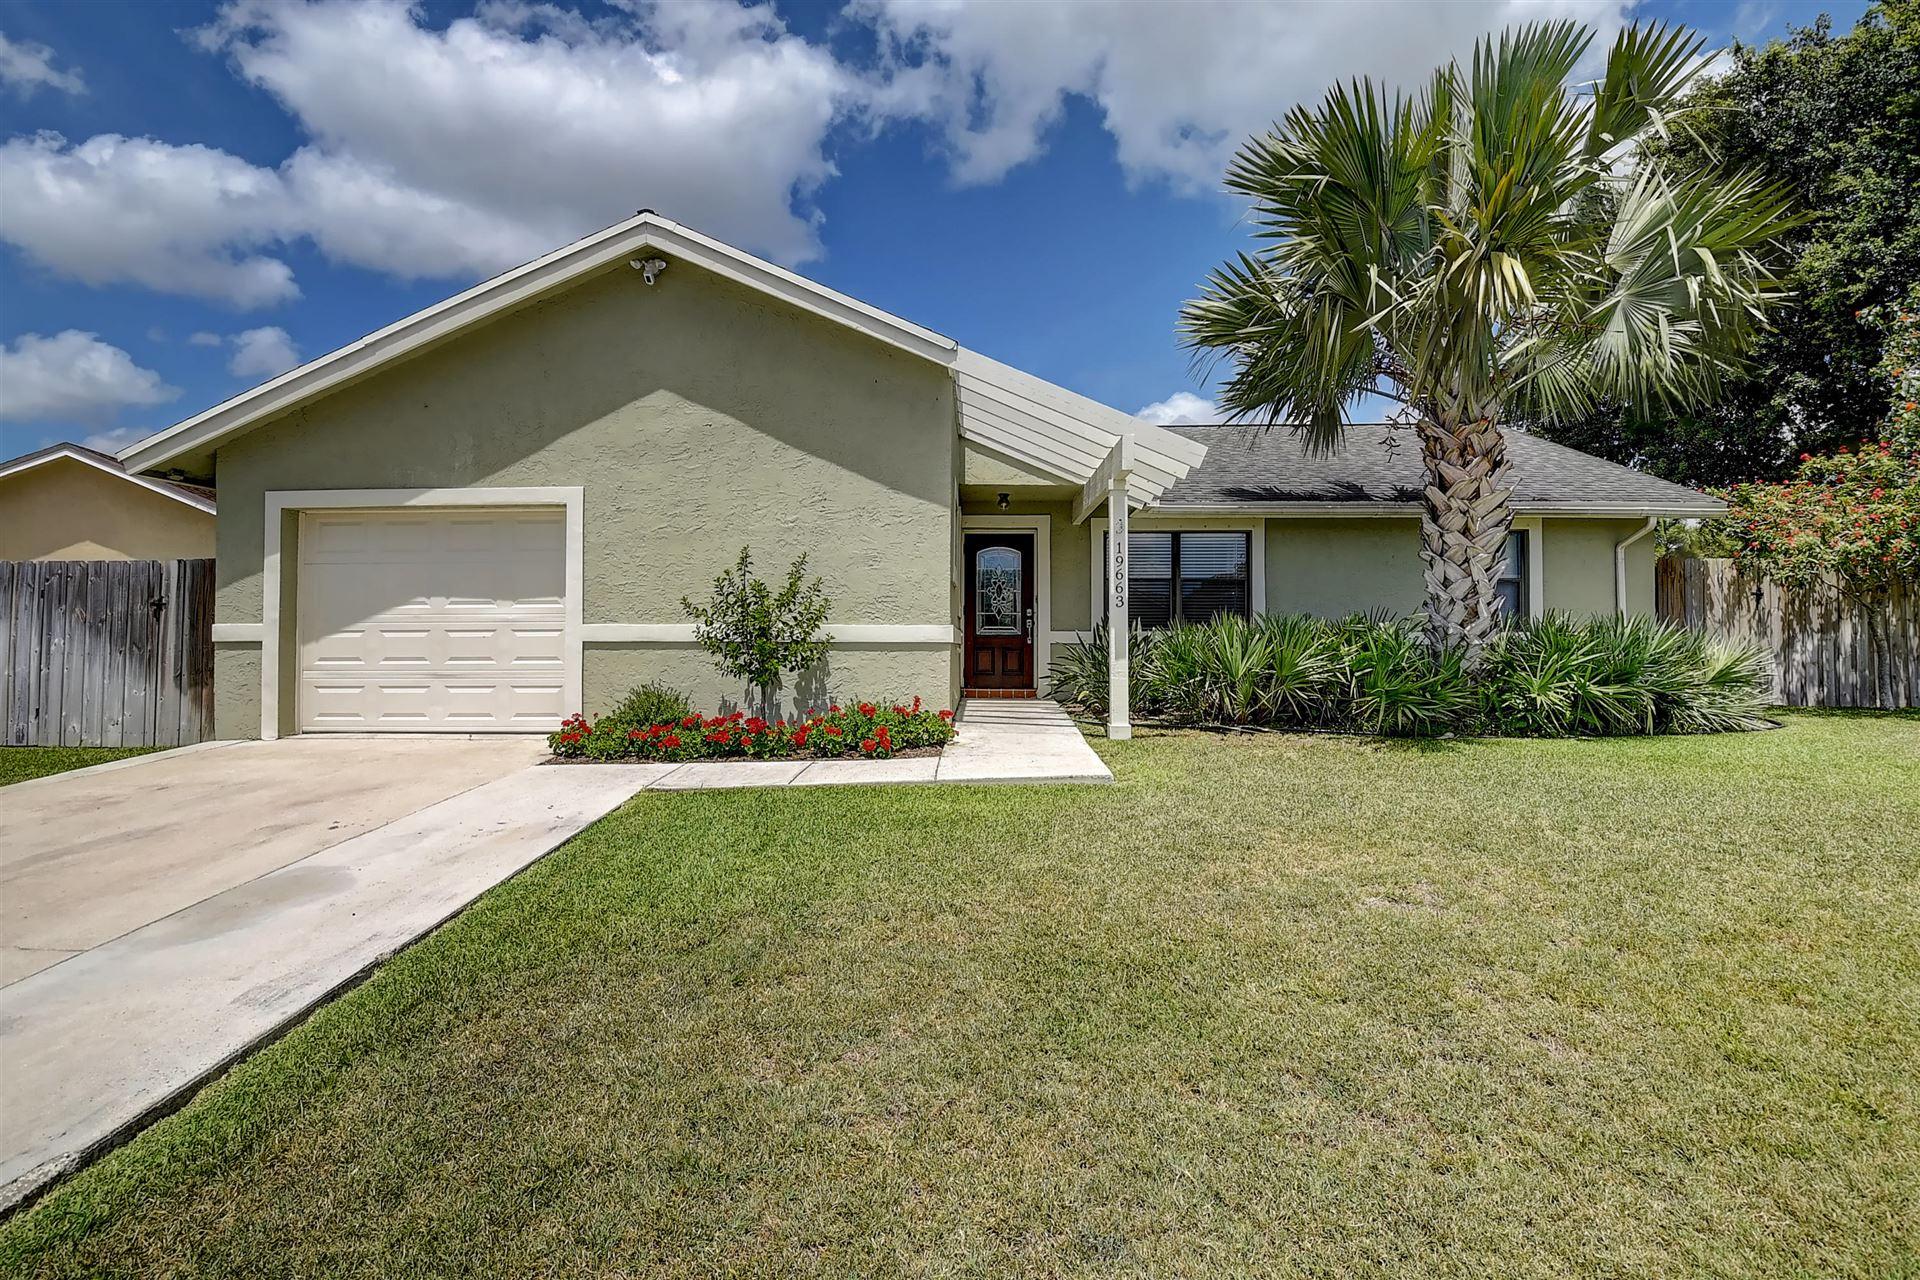 19663 Hampton Drive, Boca Raton, FL 33434 - MLS#: RX-10719270